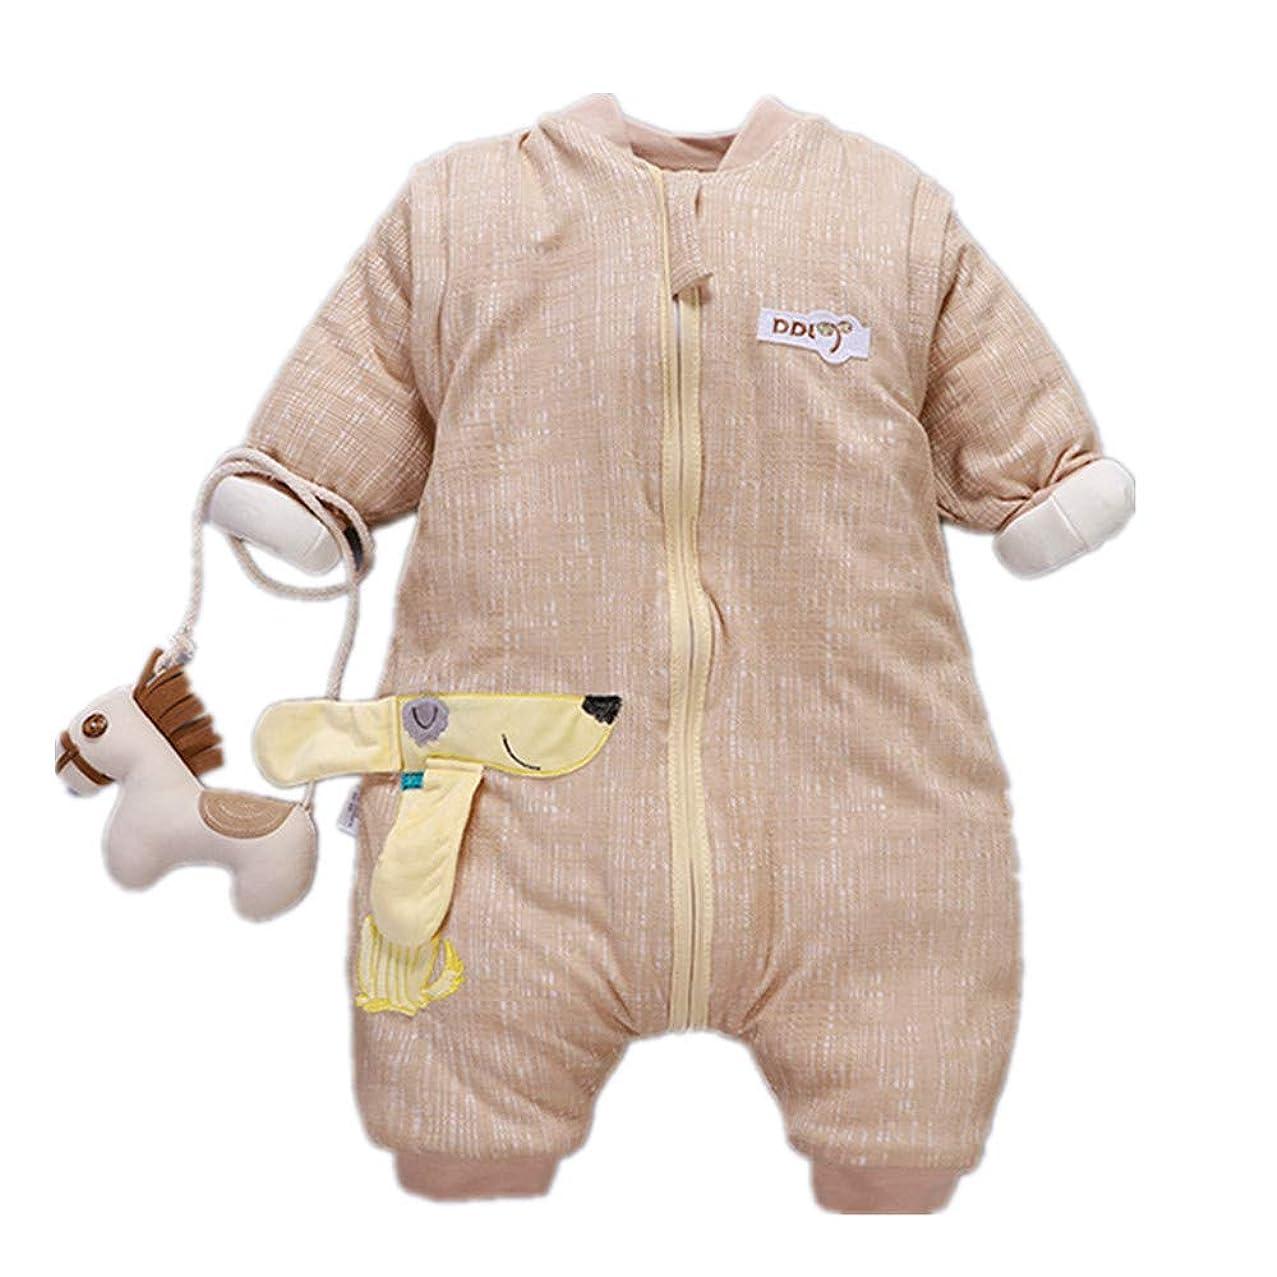 MINIKATA Wearable Blanket from MINIKATA, 4 Season Merino Wool Baby Sleep Bag or Sack, 2mo-2yrs (Yellow/M(23.6-31.5in))